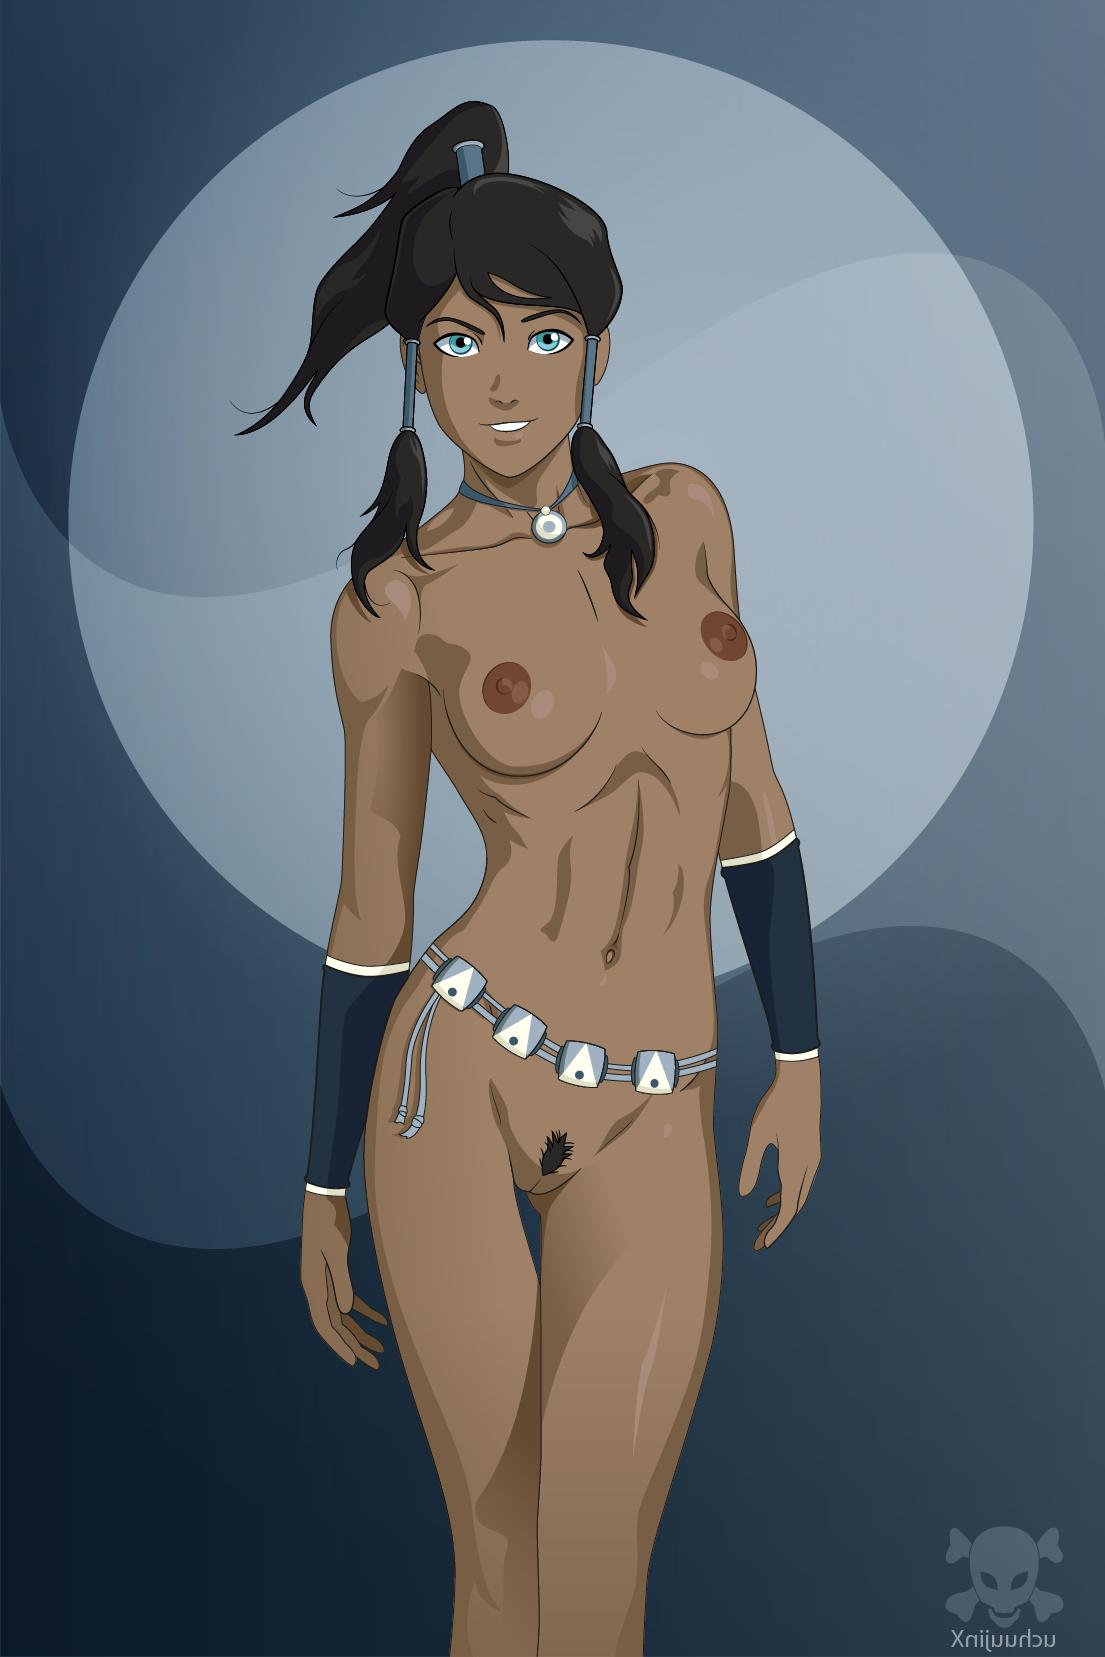 Avatar the last airbender girls fully naked